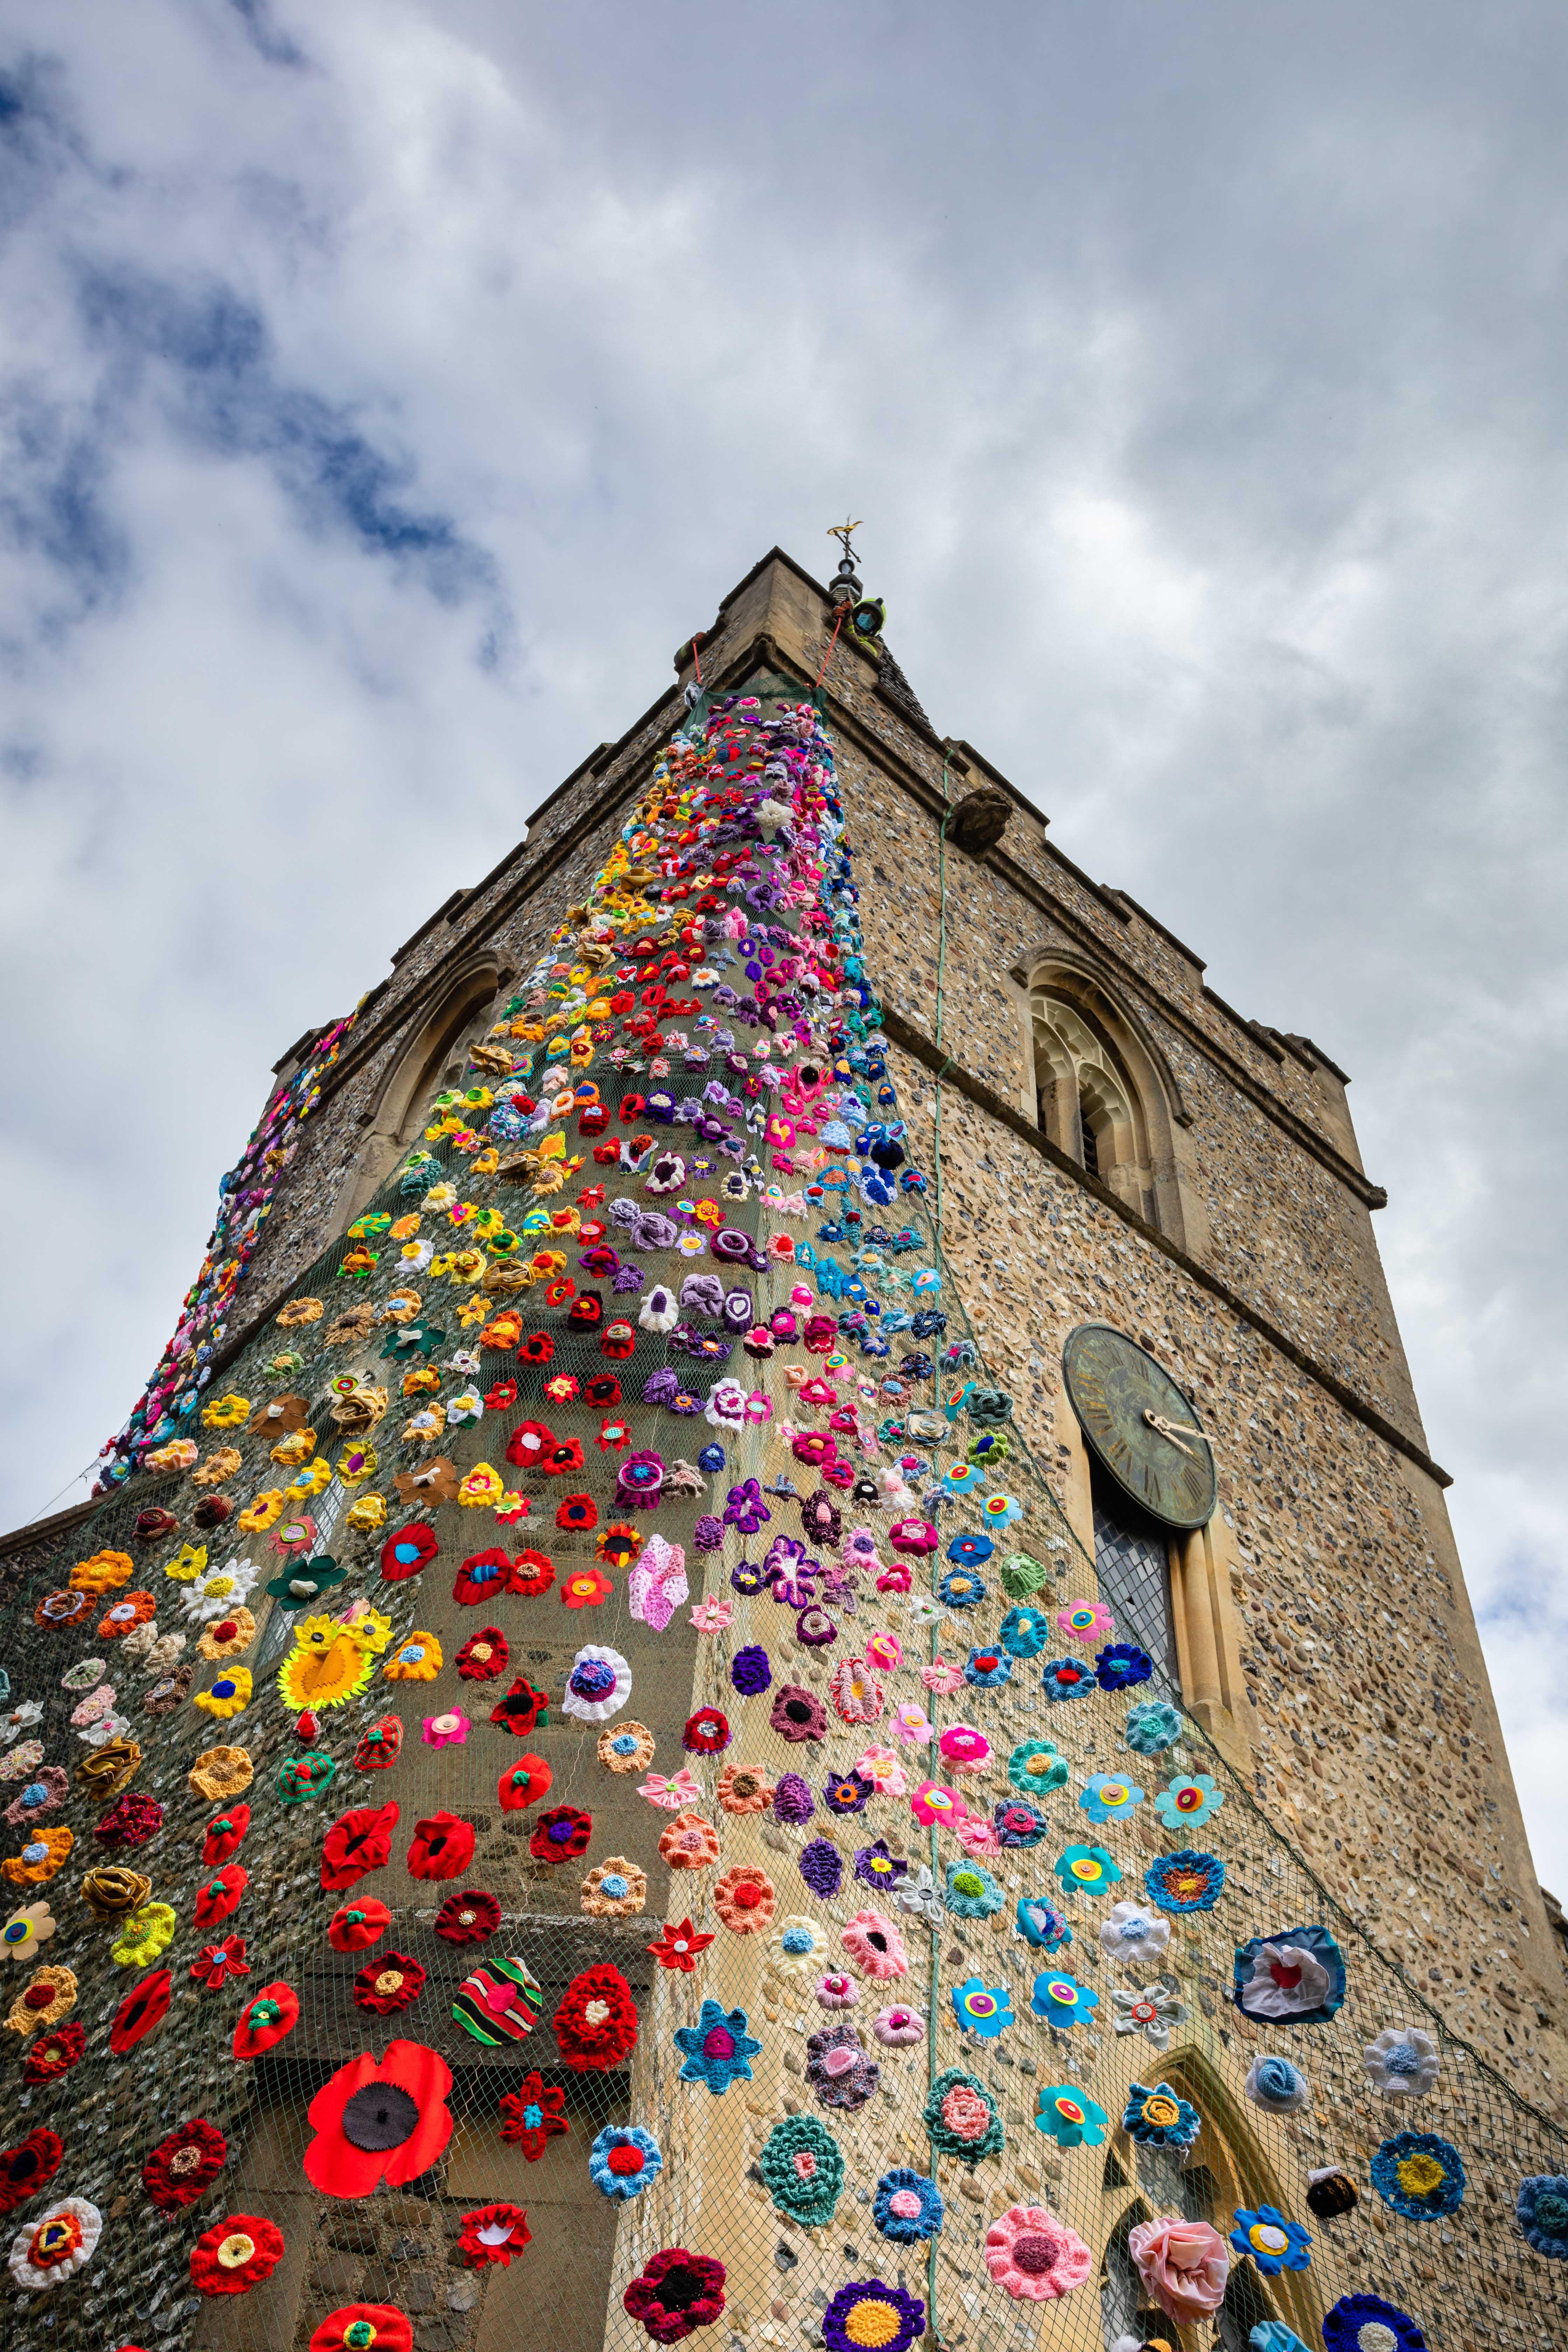 Barley Flower Tower Update